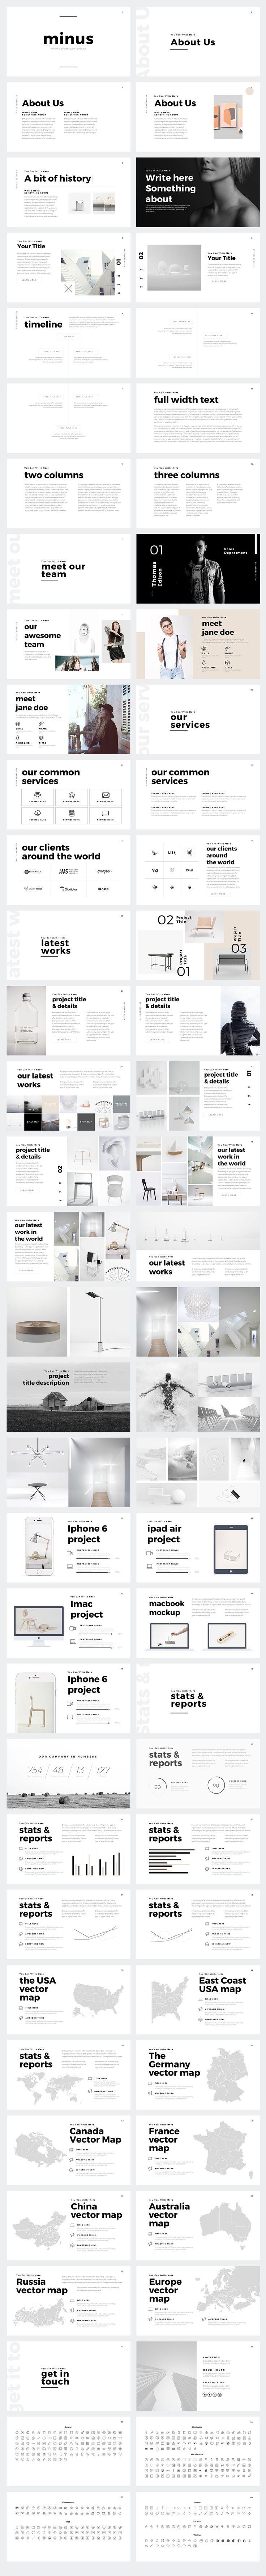 56 best presentation design inspiration images on pinterest page minus minimal powerpoint template toneelgroepblik Gallery